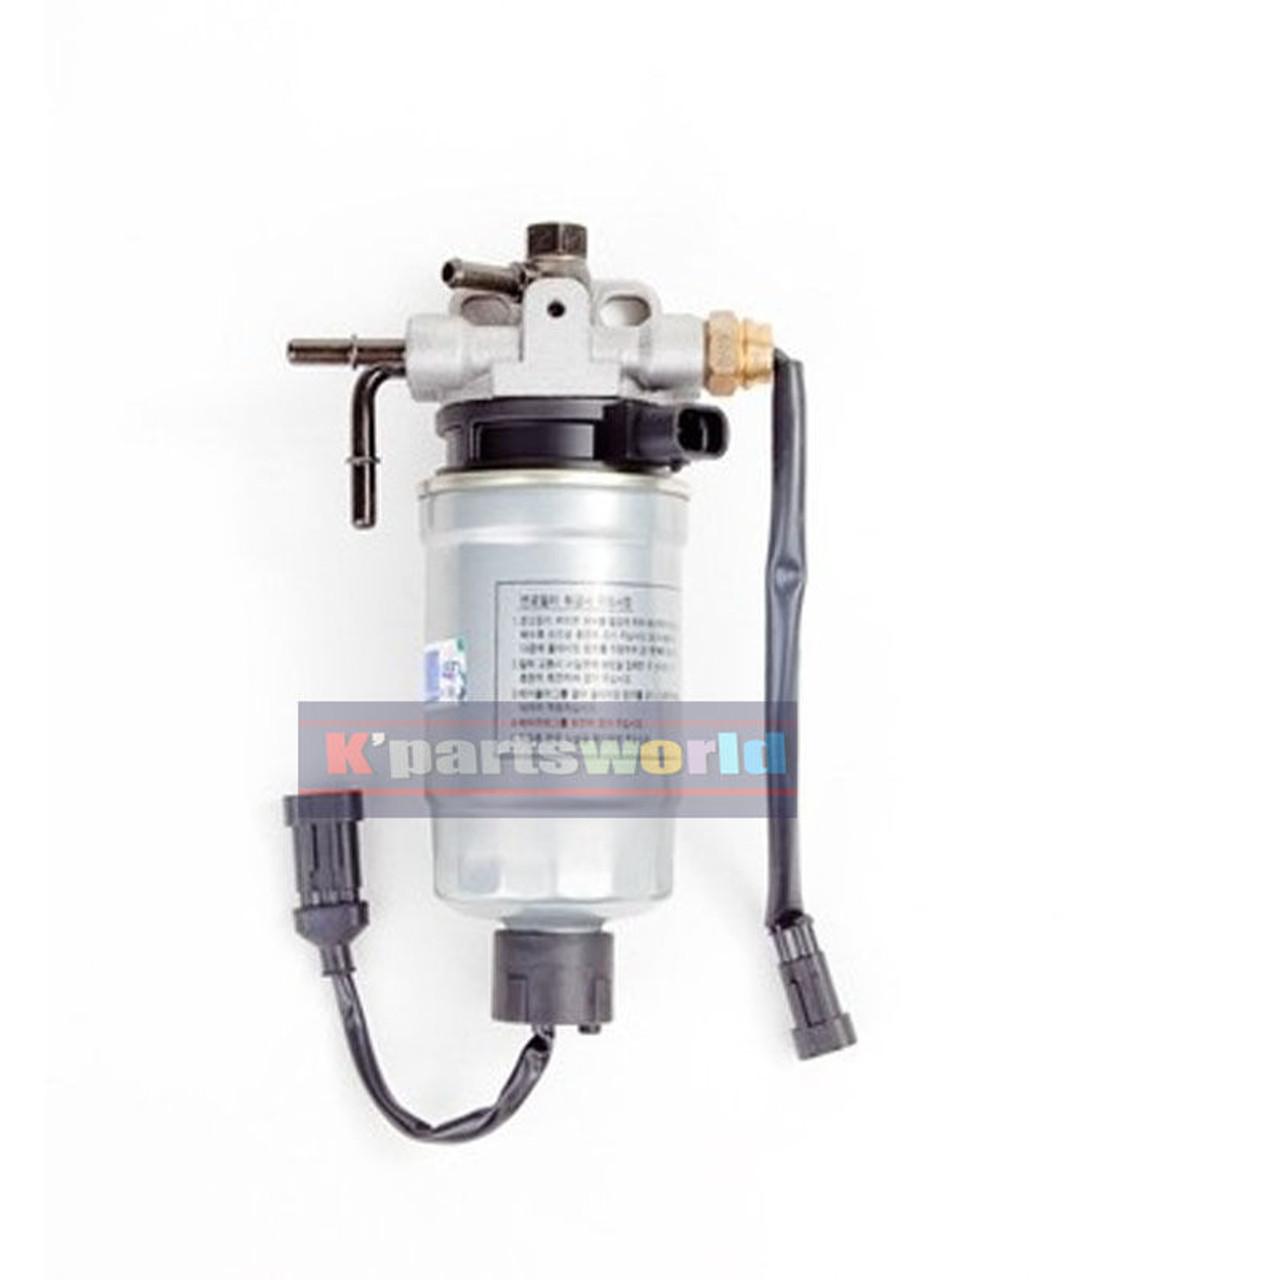 hight resolution of fuel filter water separator assy 319703e10a 31970 3e10a for kia sorento 2004 09